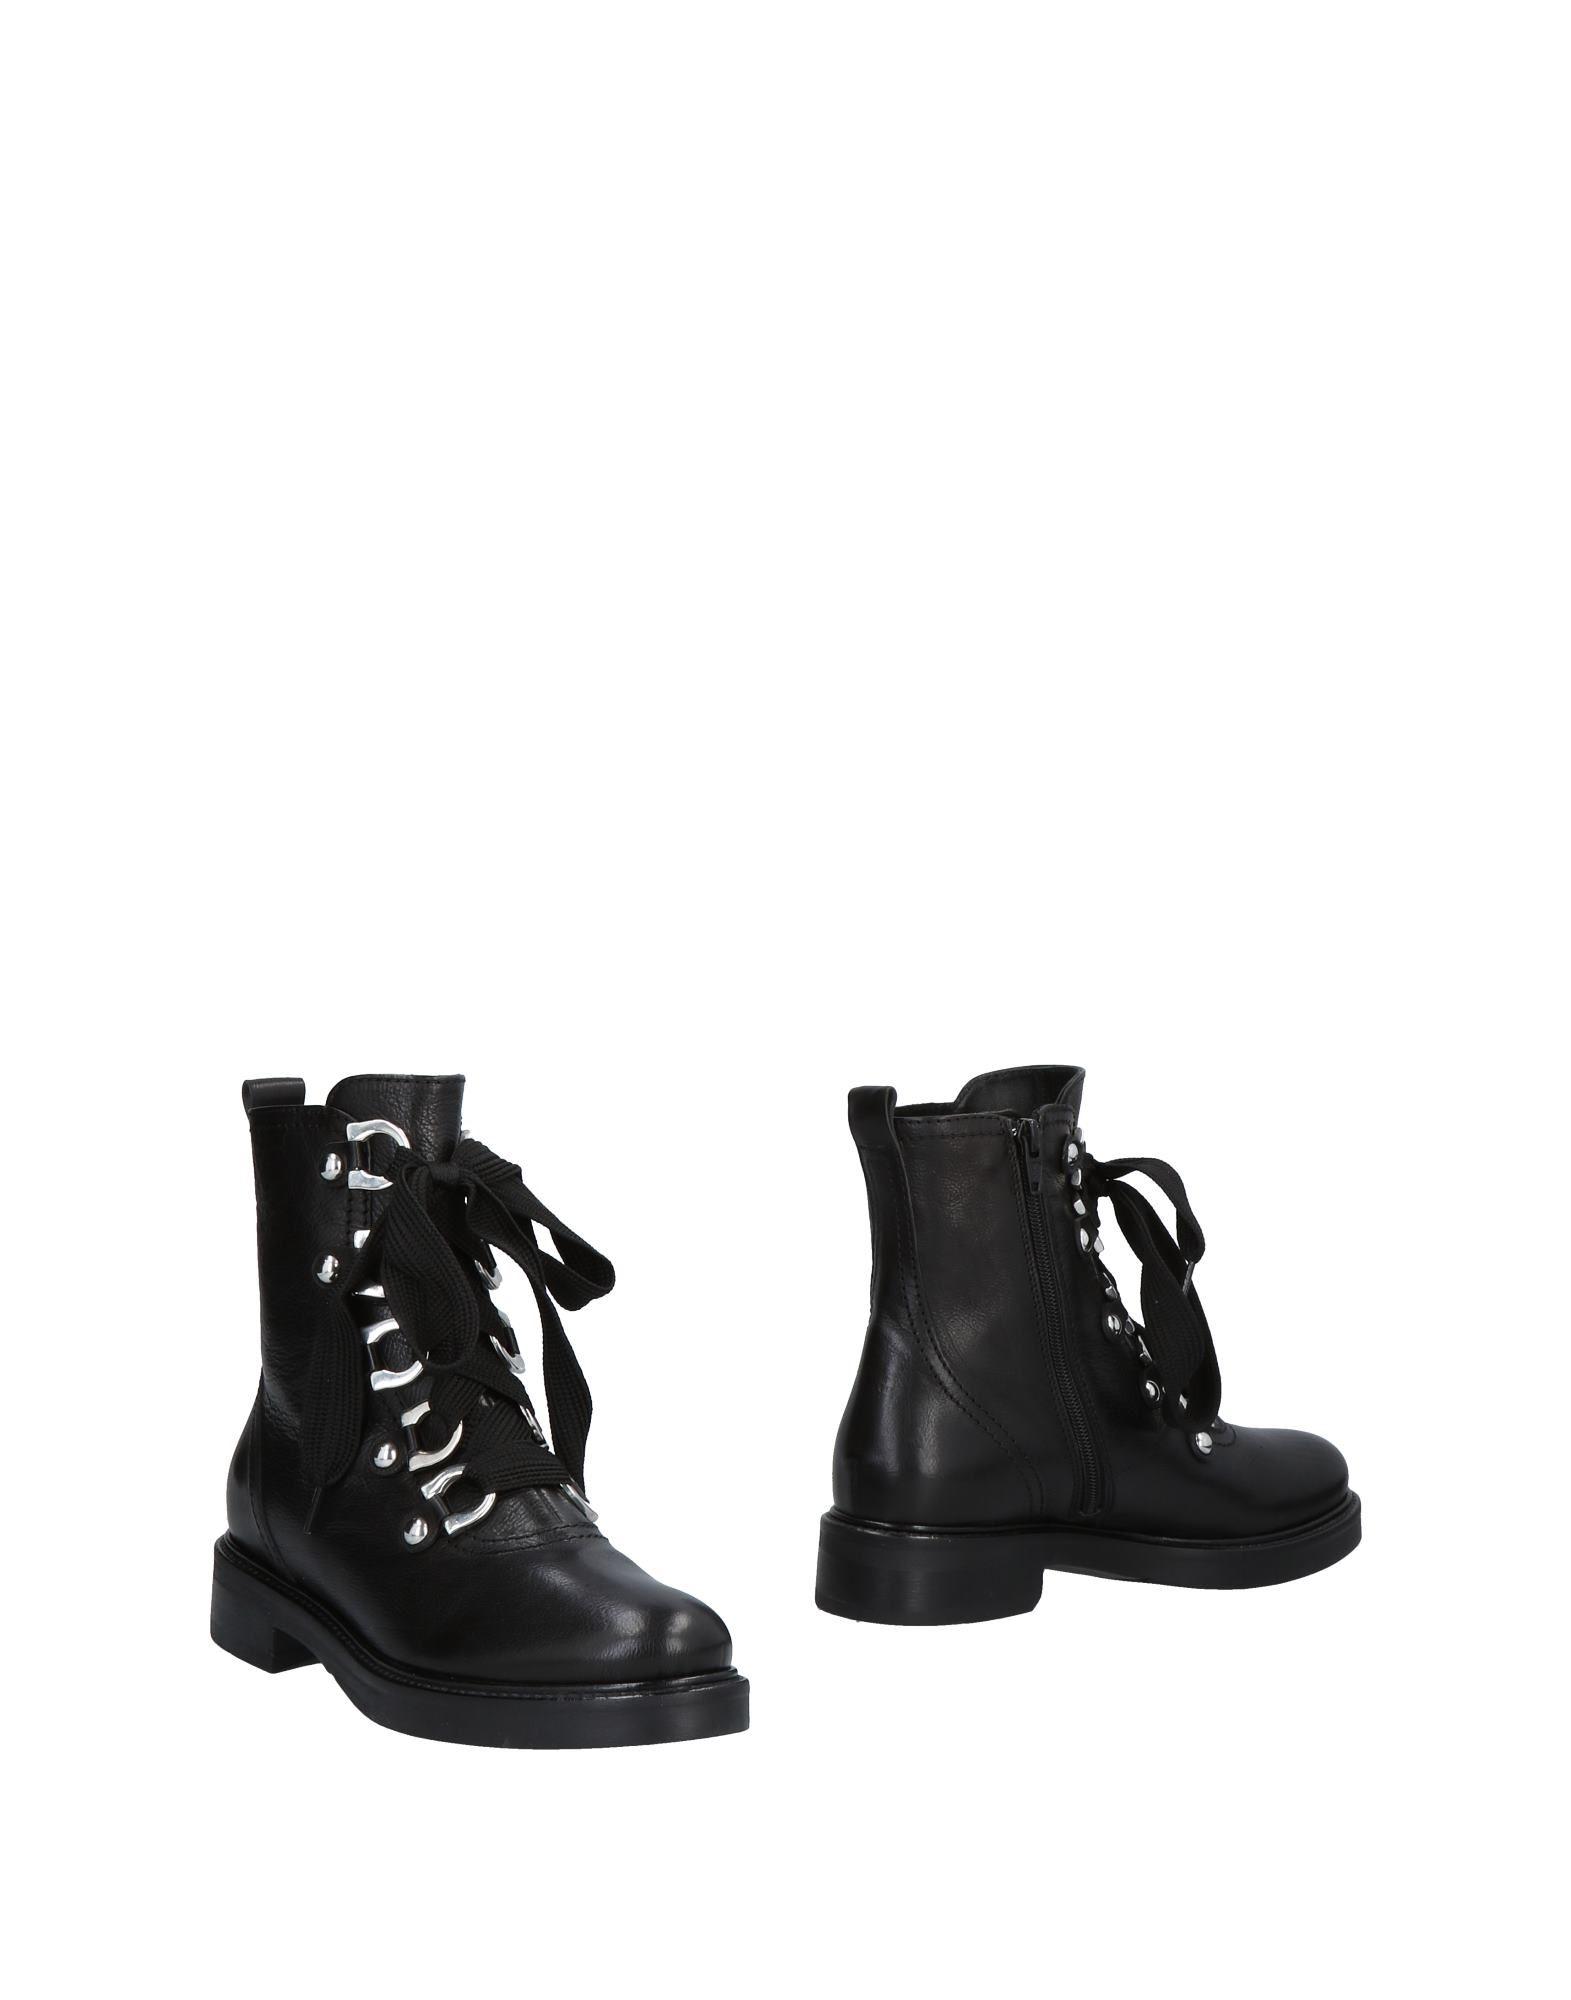 Porta Borsari Ankle Boot - Women Porta Borsari Ankle United Boots online on  United Ankle Kingdom - 11491359TU 77483d